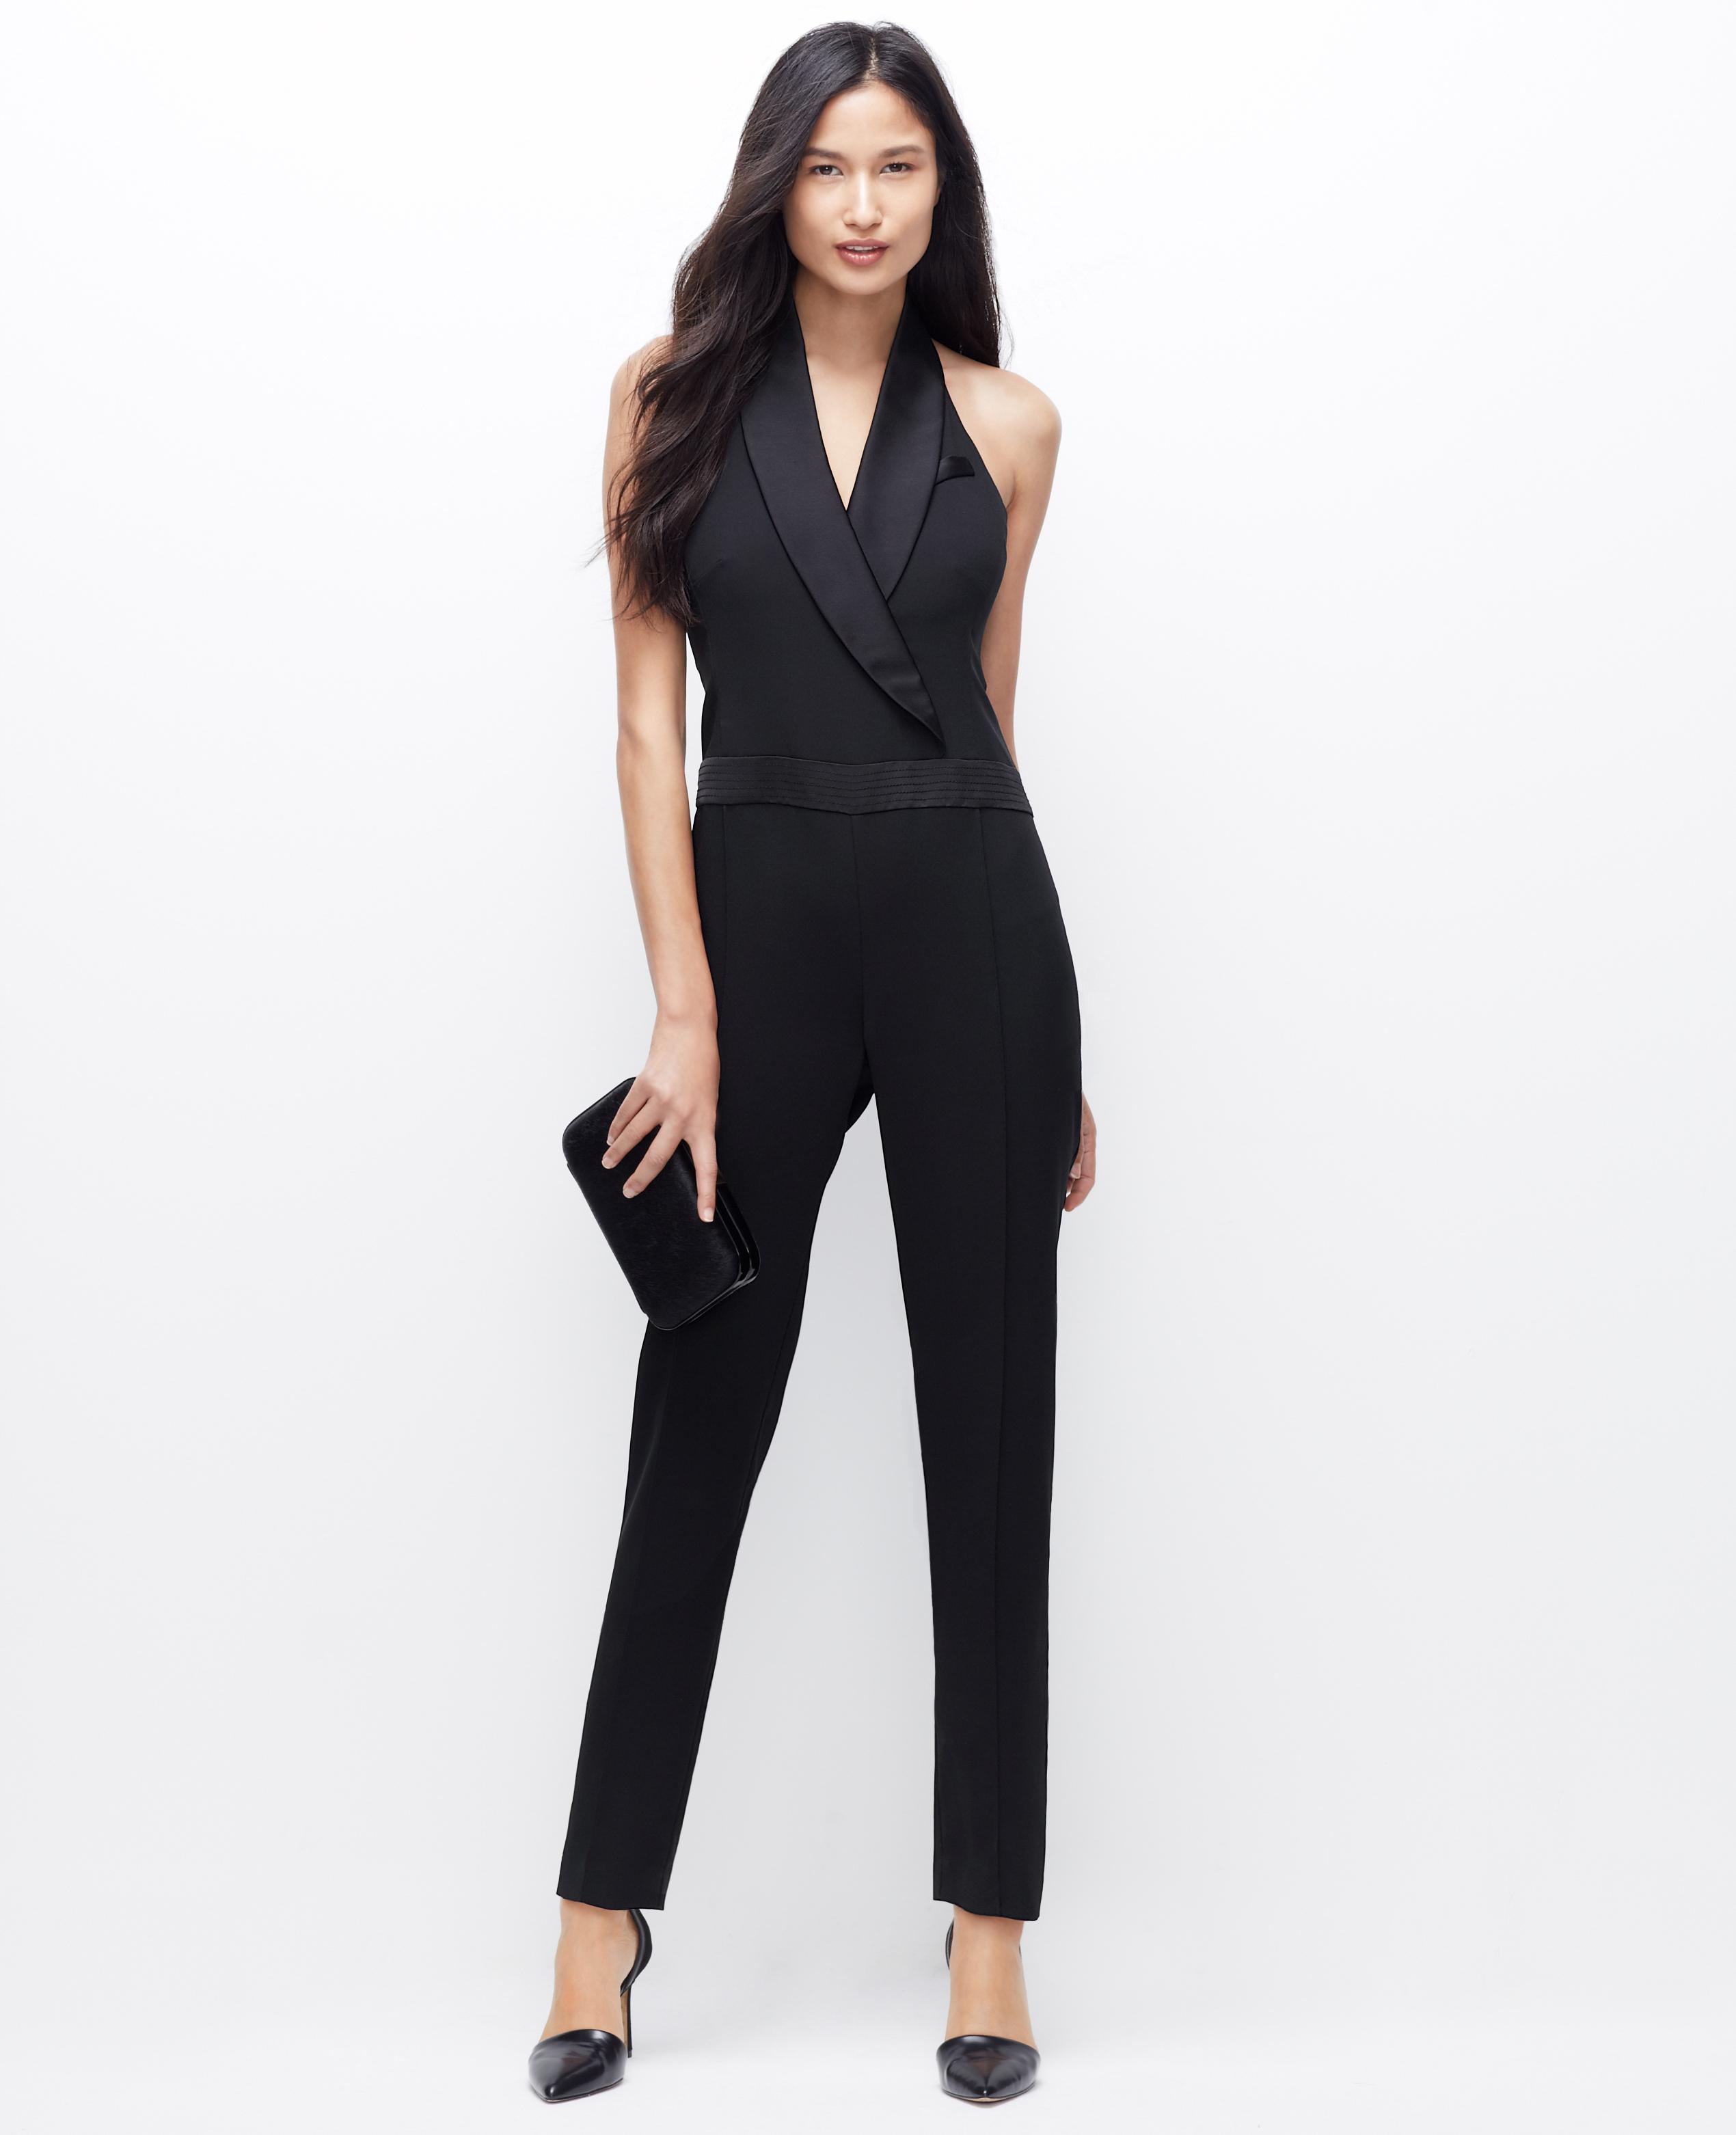 90776e21b31 Lyst - Ann Taylor Petite Tuxedo Jumpsuit in Black